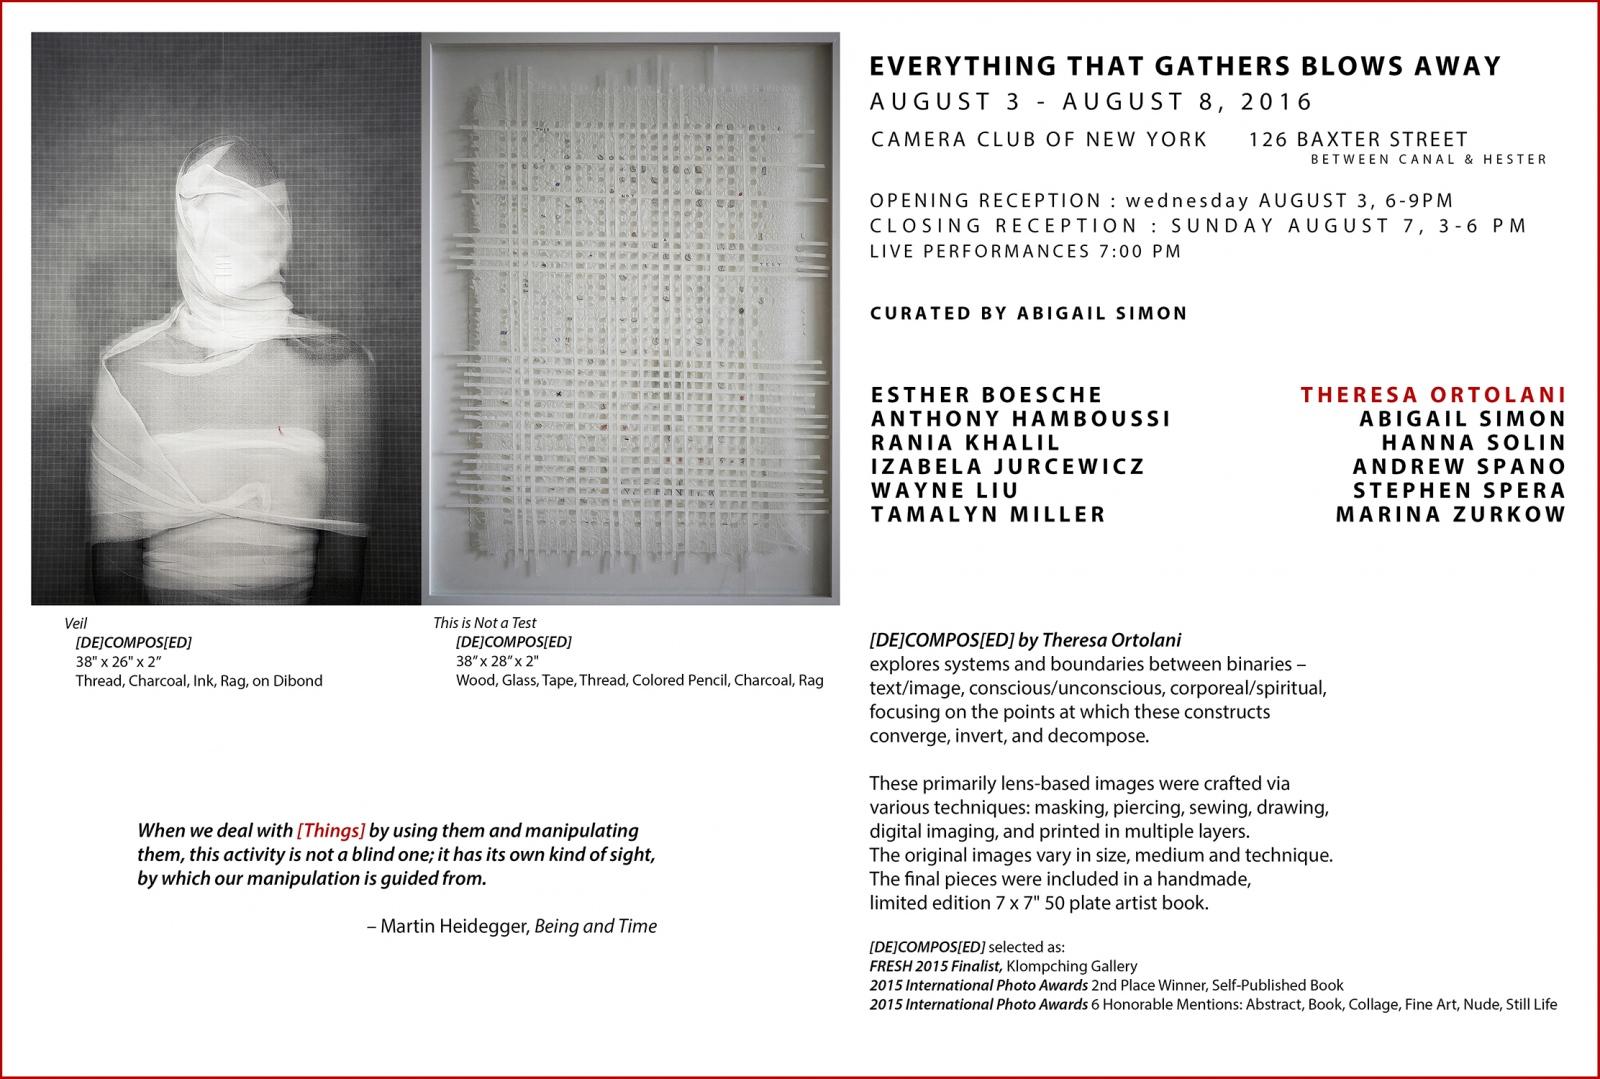 Art and Documentary Photography - Loading EverythingThatGathersBlowsAway.jpg